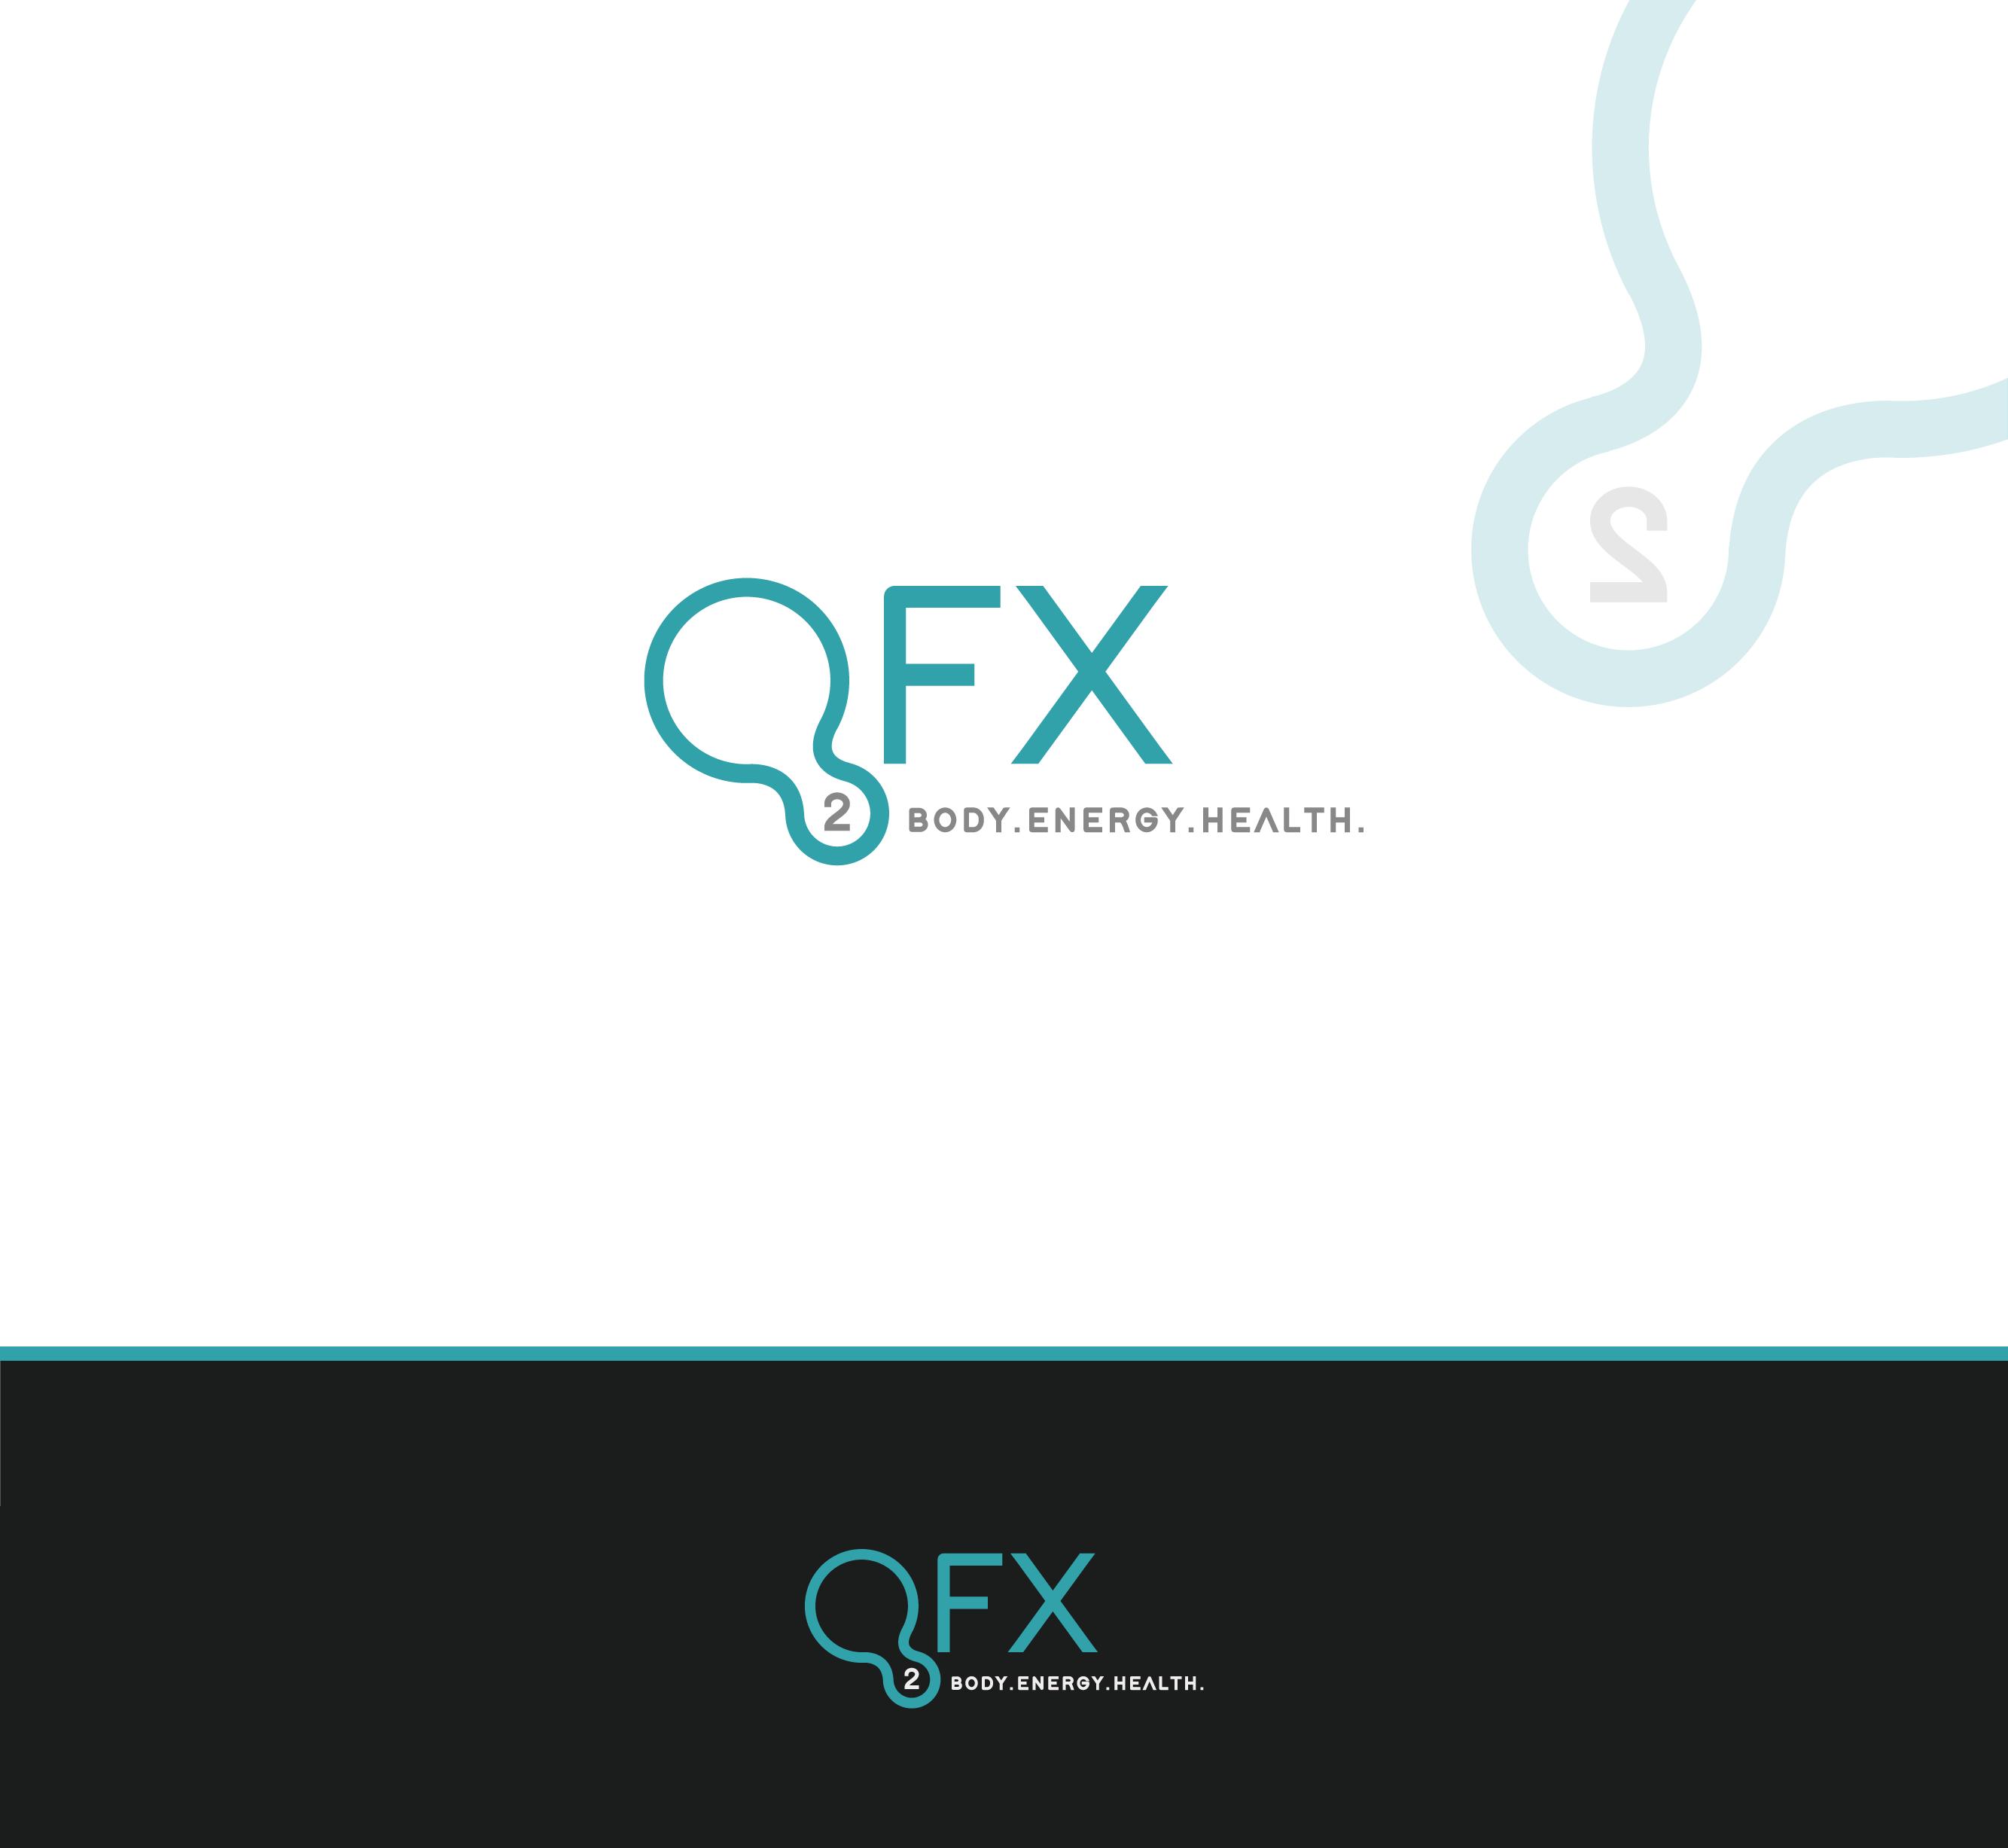 Logo Design by Aleksandar Stankov - Entry No. 22 in the Logo Design Contest Captivating Logo Design for O2FX.